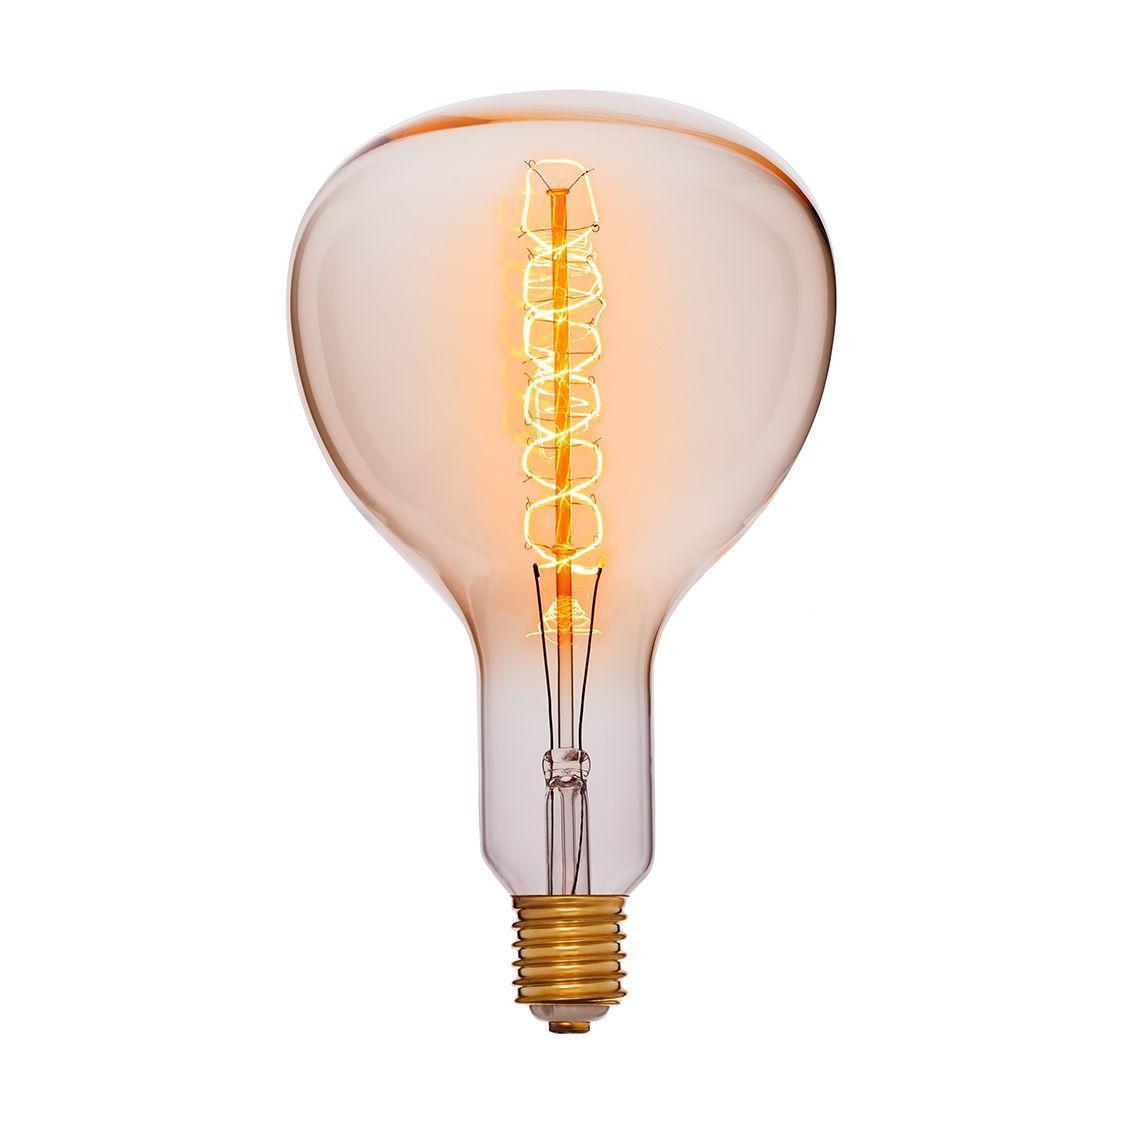 Лампа накаливания E40 95W прозрачная 053-839 цена